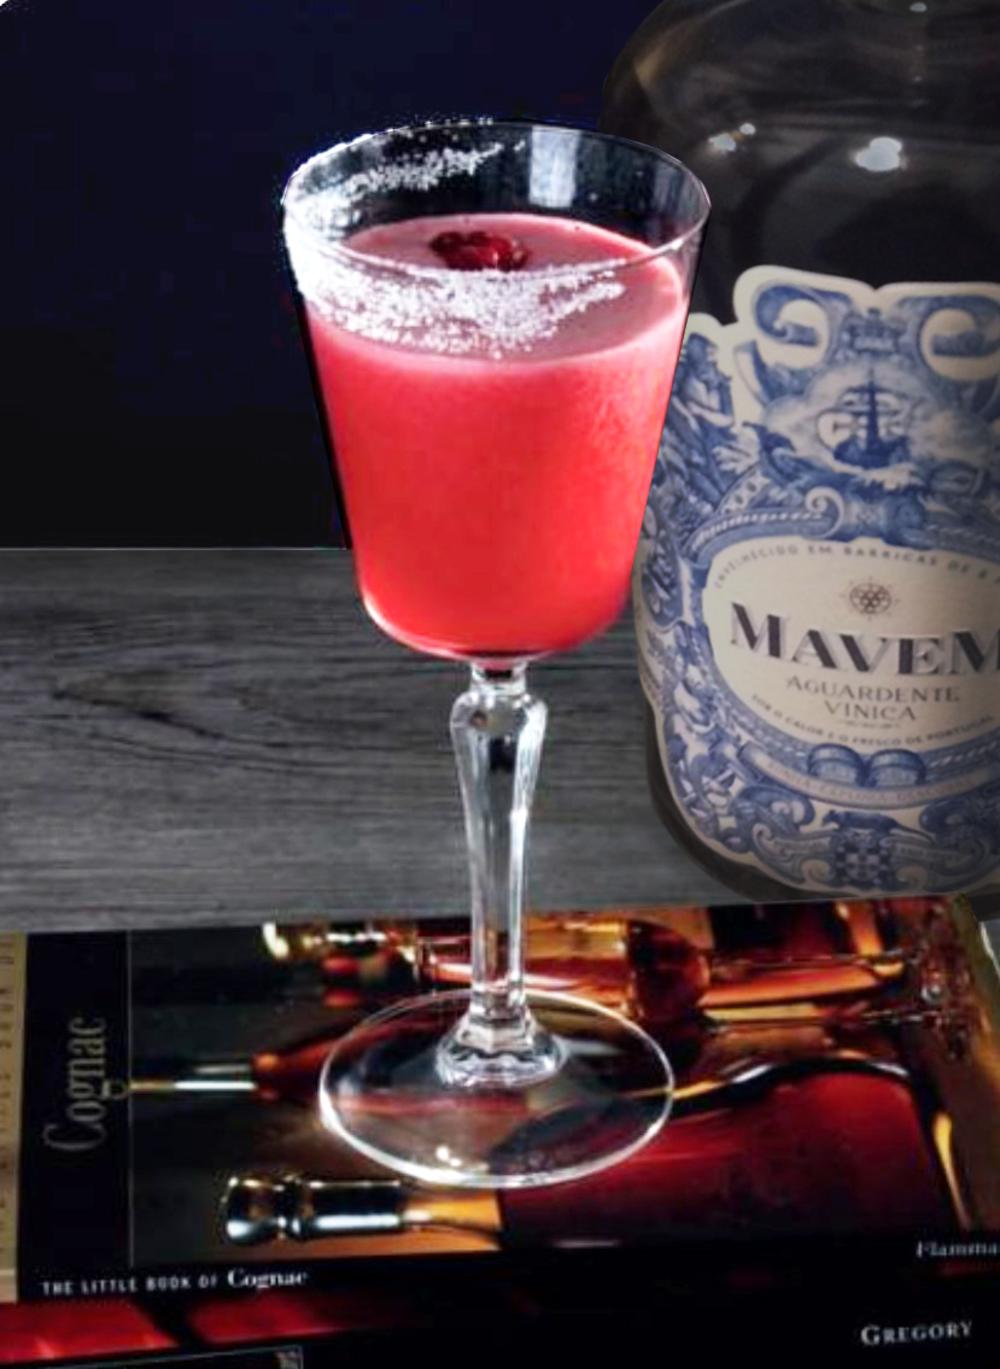 Bon-plan-recette-cocktail-Mavem_saint_valentin.jpg